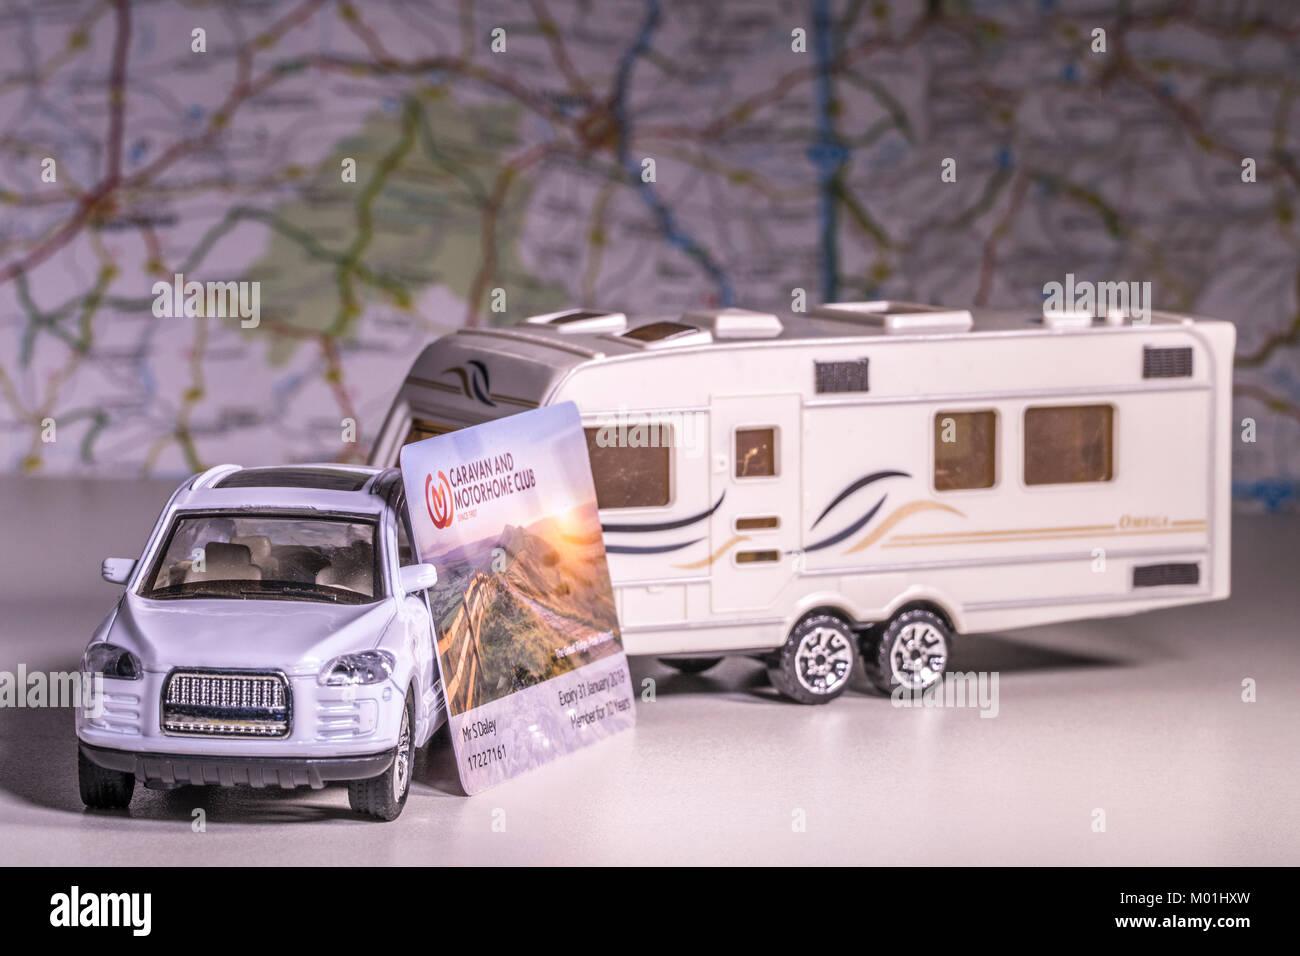 Model caravan and car with UK 'Caravan and Motorhome Club' membership card and defocused map / atlas. Concept of touring using a campsite network. Stock Photo